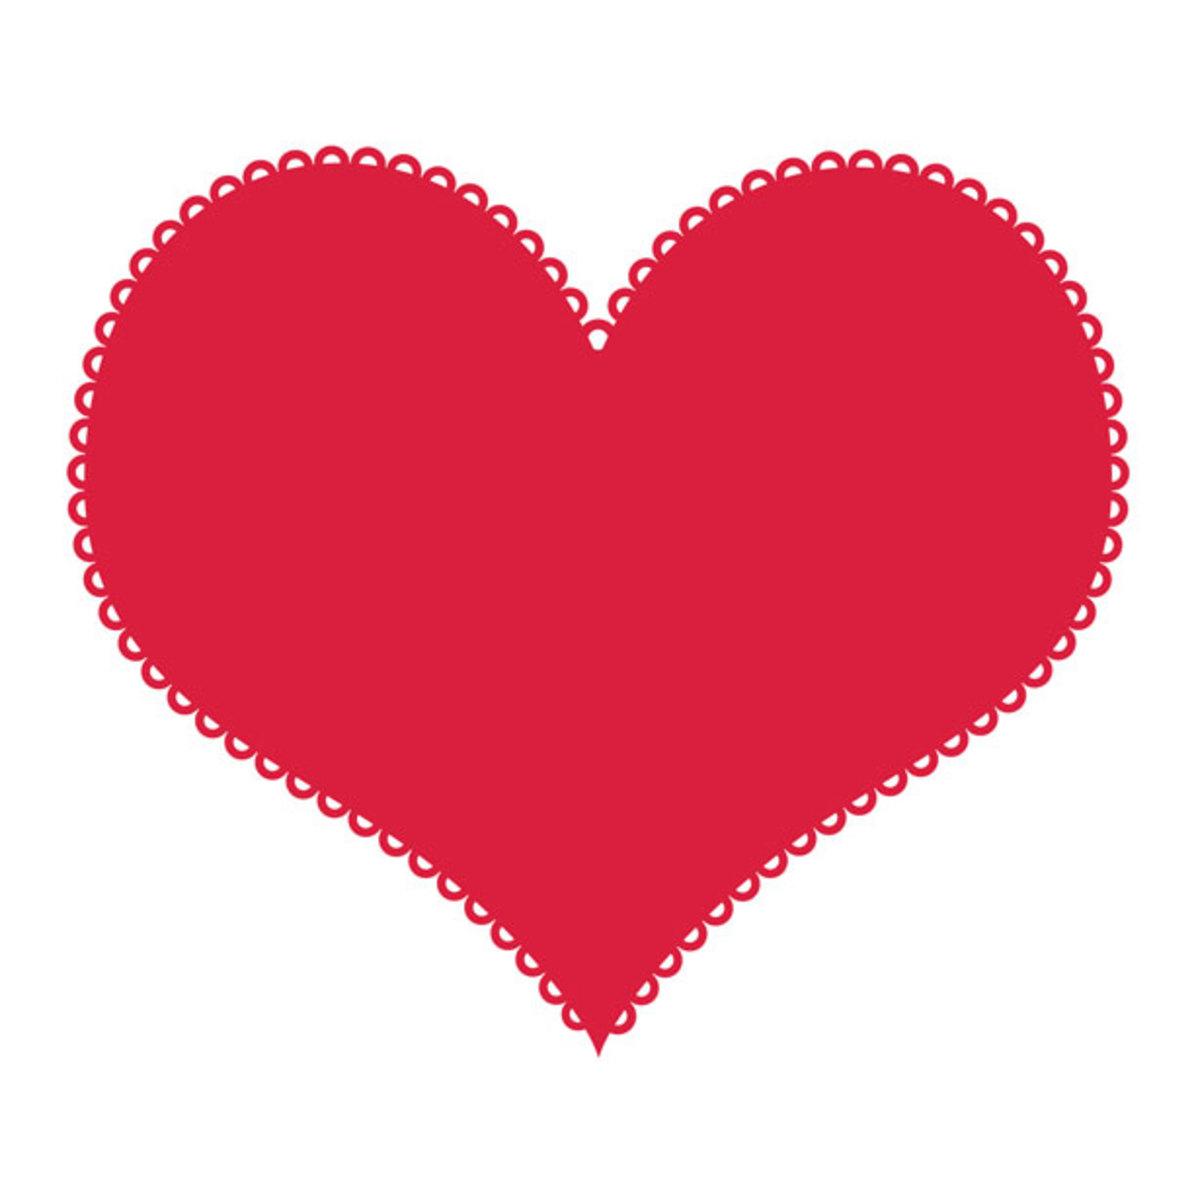 Simple Heart shape